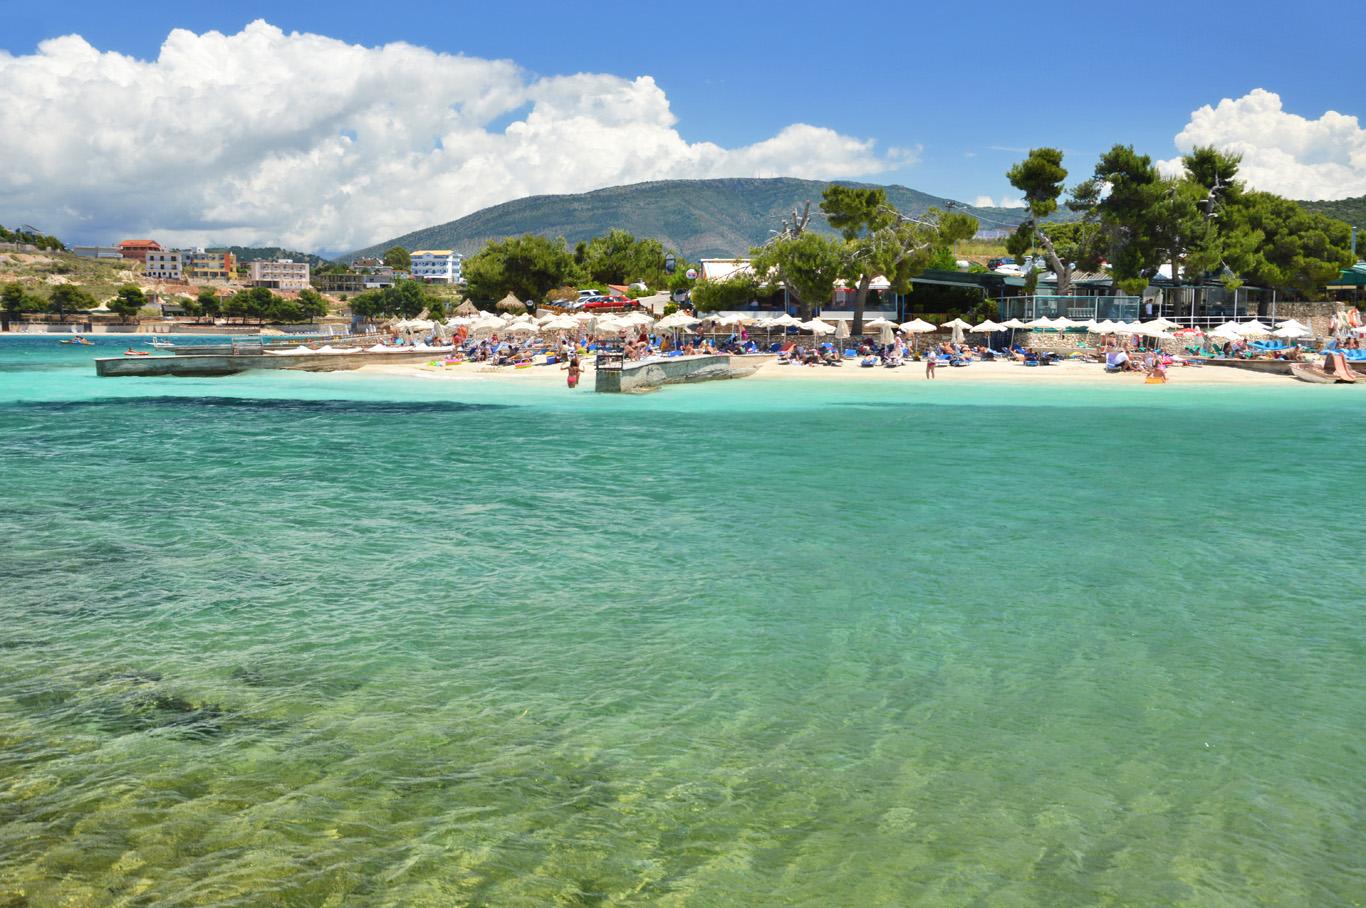 Ksamil Albania Beaches